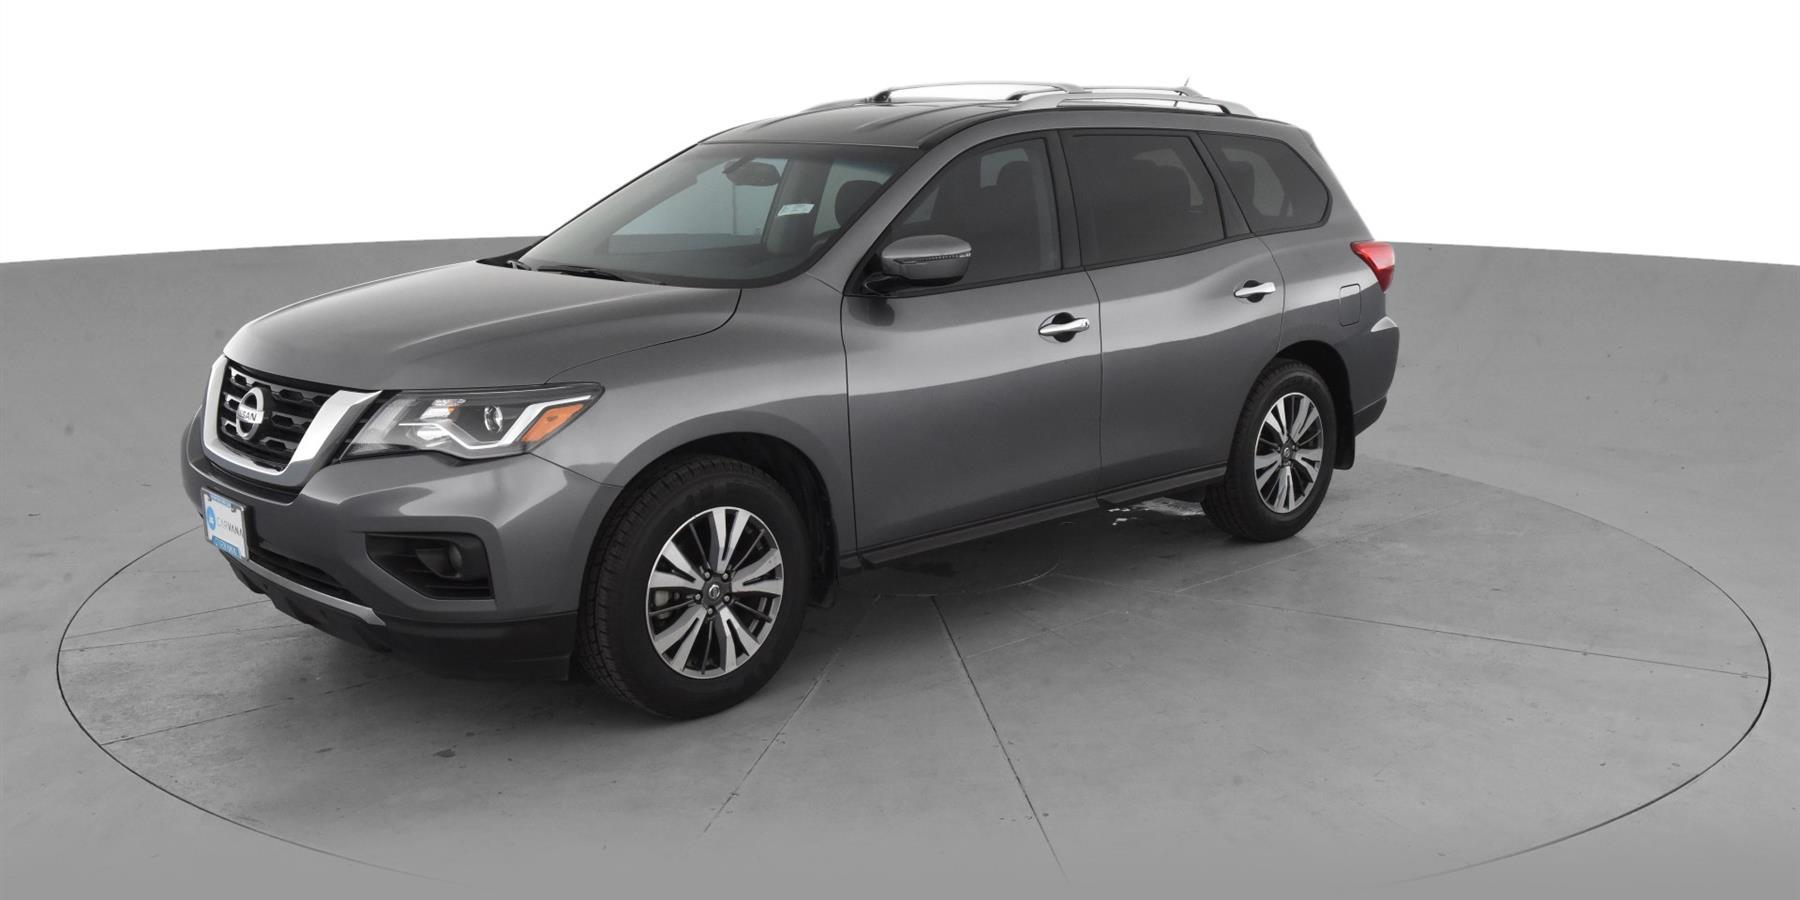 2017 Nissan Pathfinder SV Sport Utility 4D for Sale | Carvana®